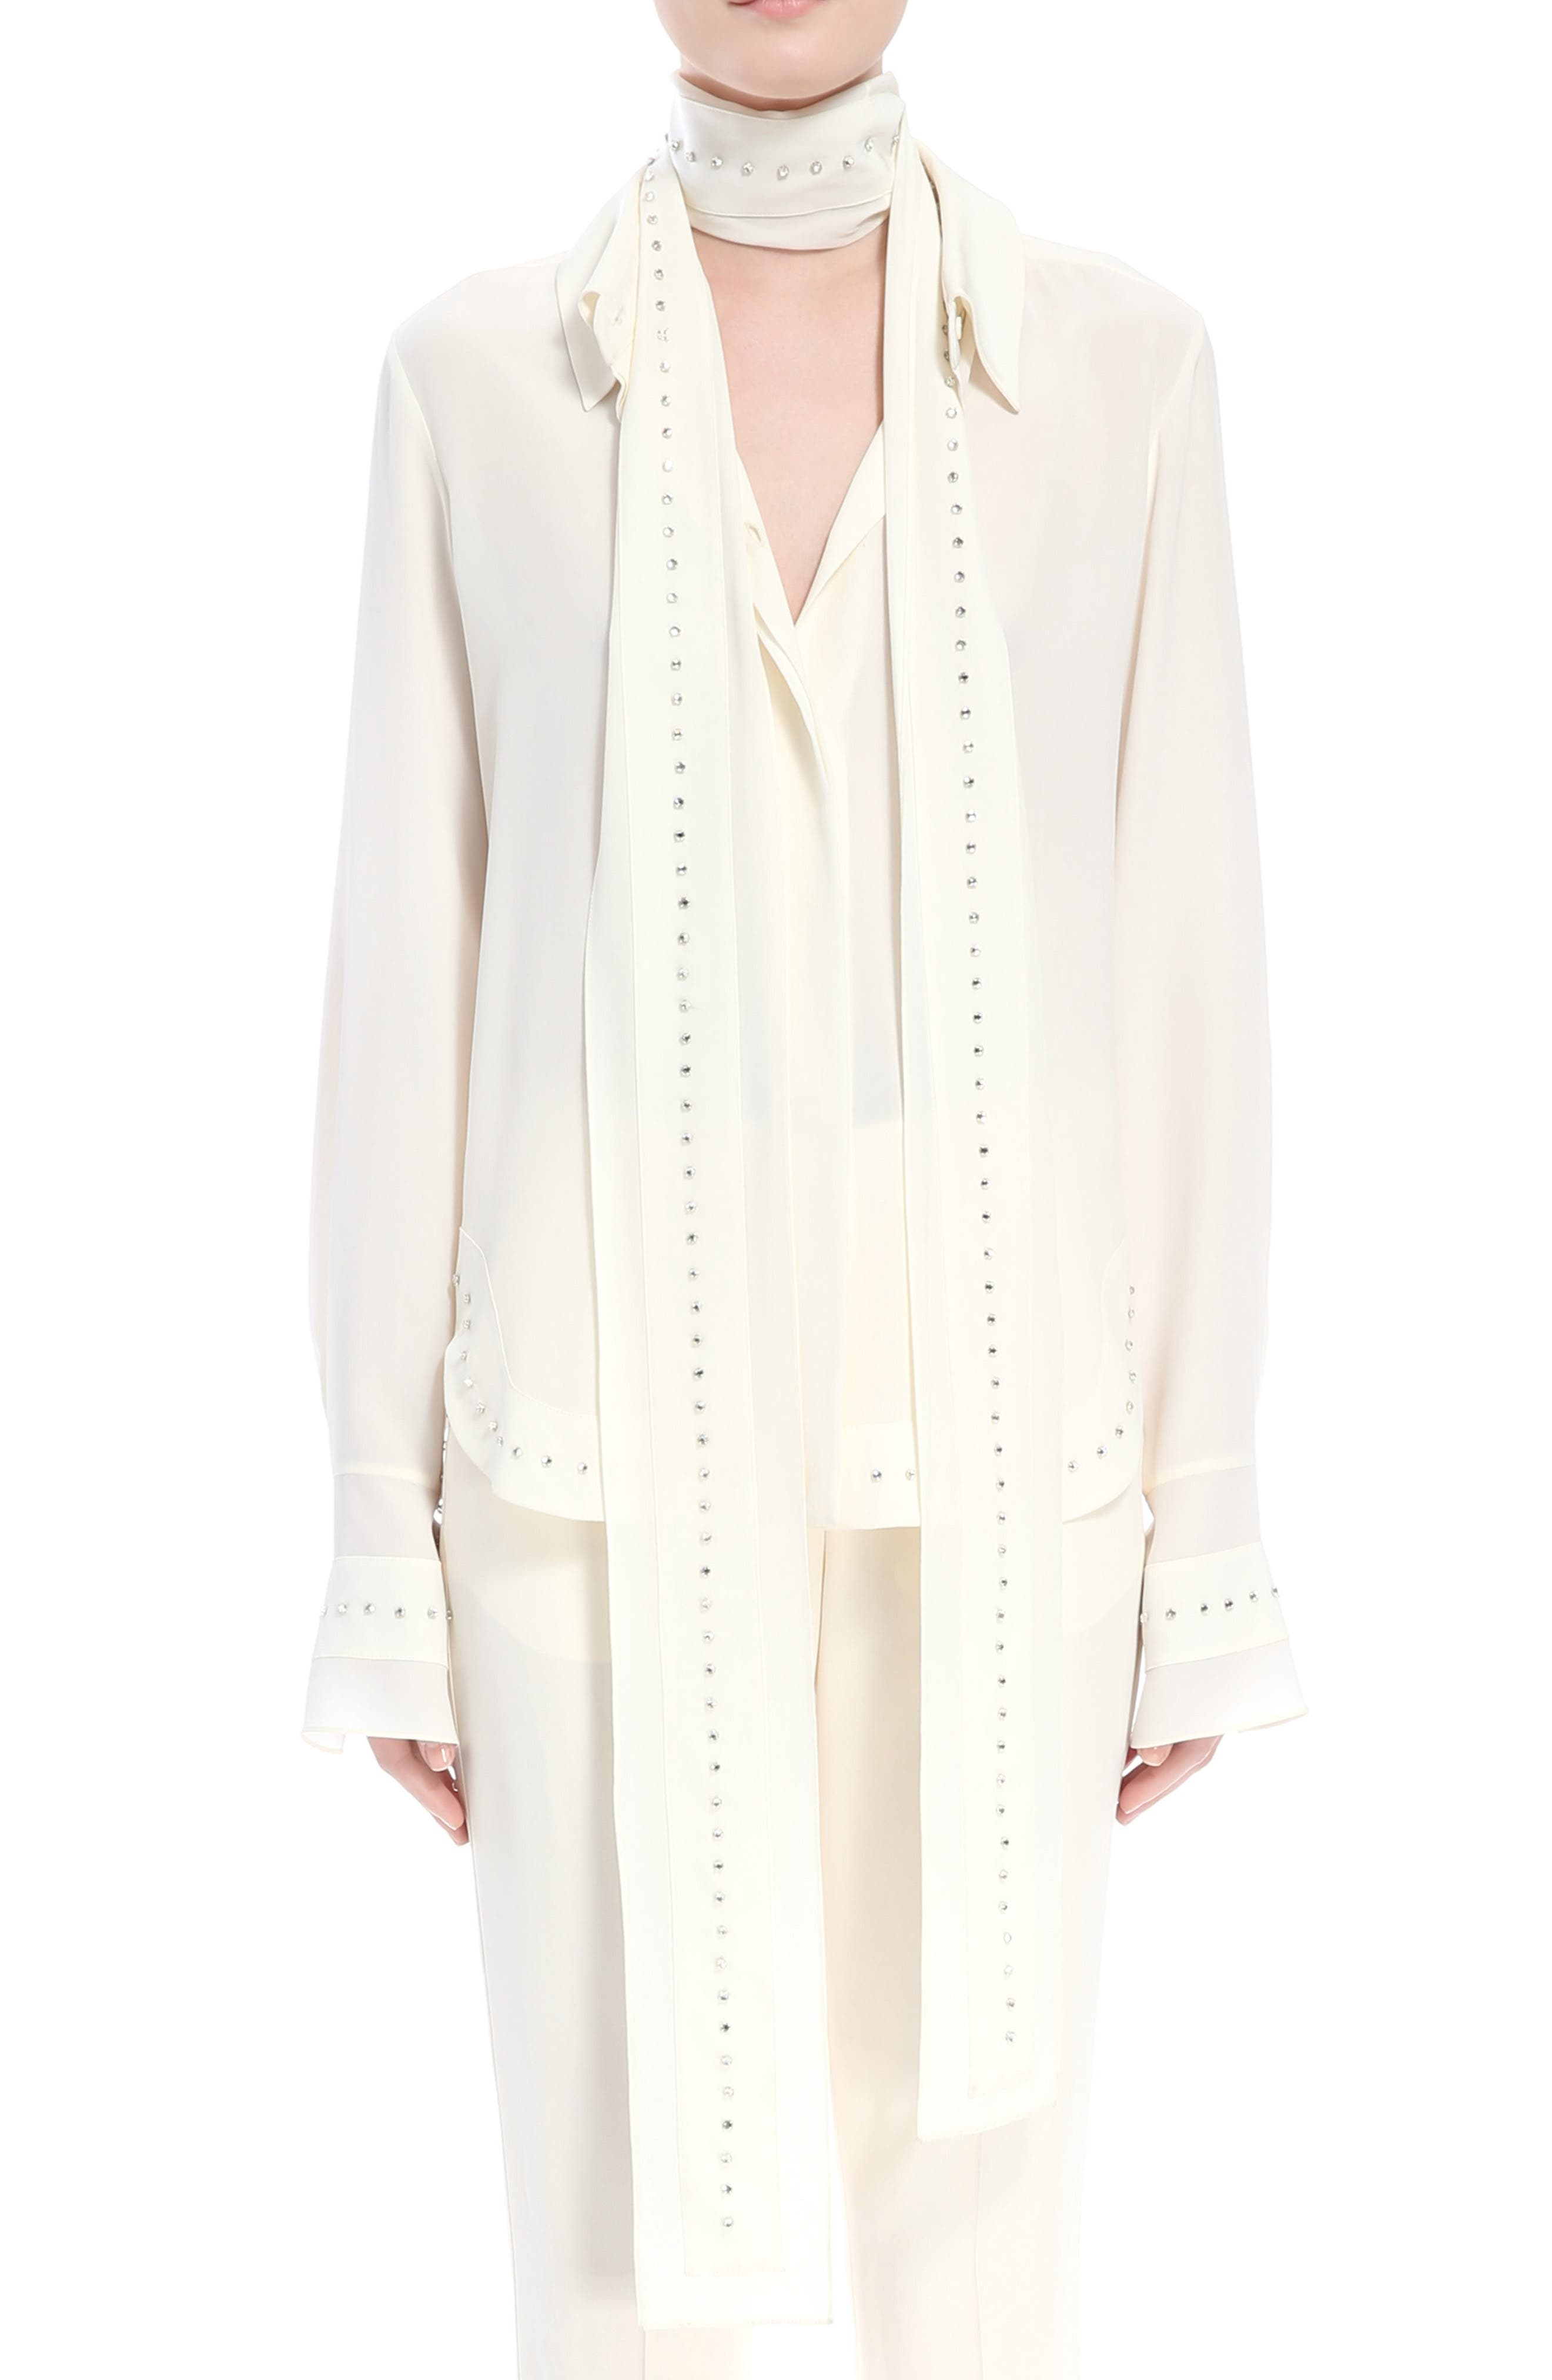 Rhinstone Trim Silk Shirt with Scarf,                             Main thumbnail 1, color,                             Eden White